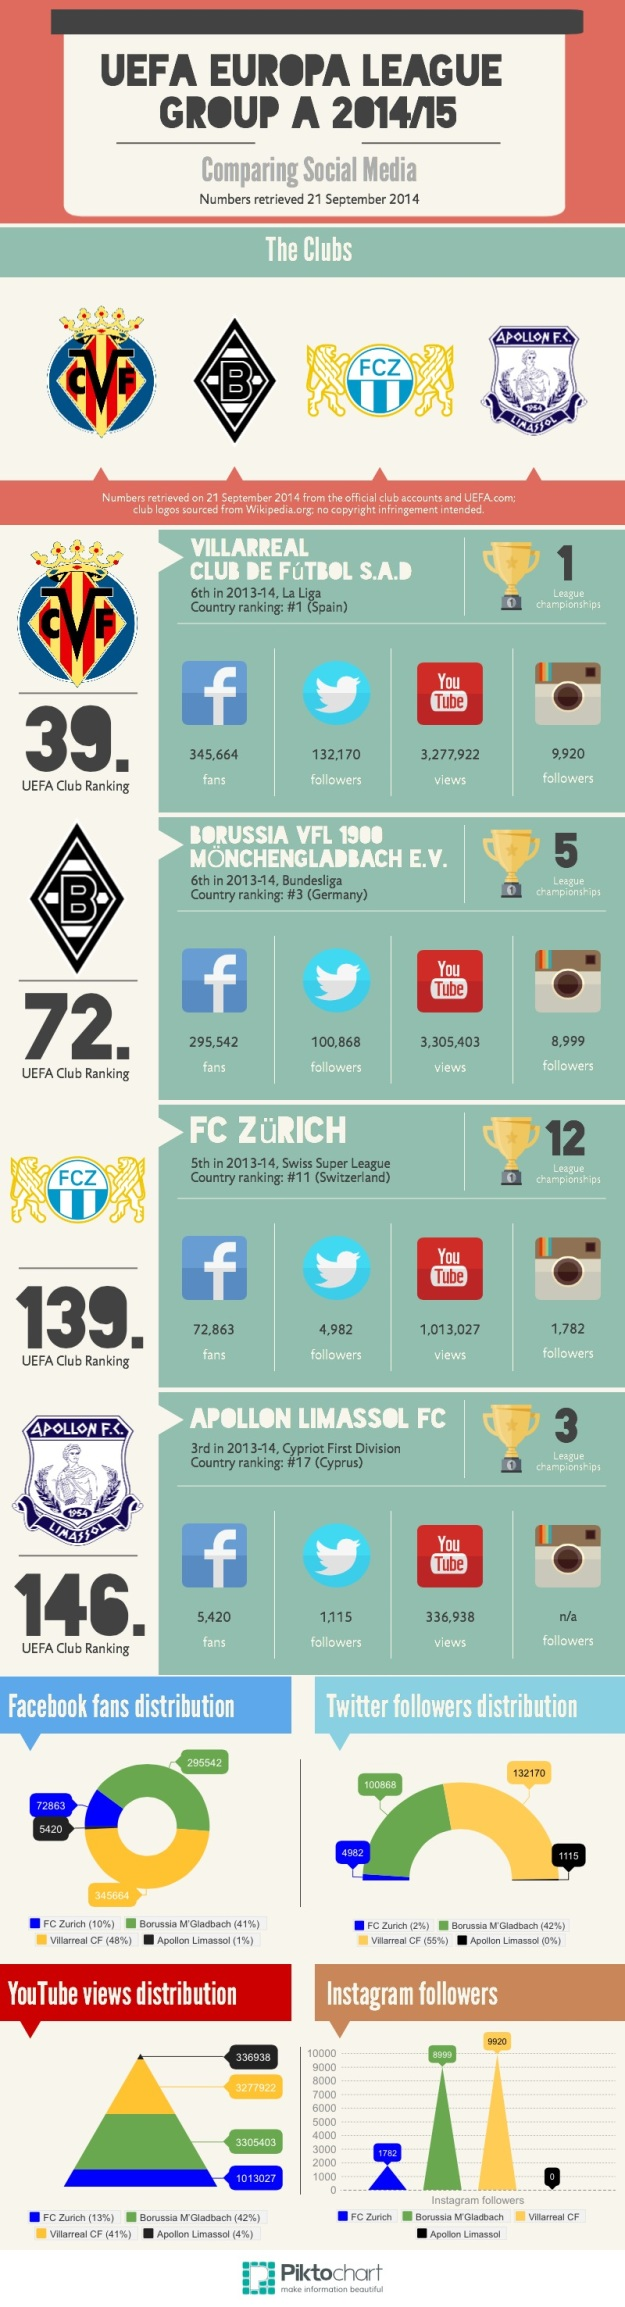 UEFA Europa League 2014/15 Group A infographic